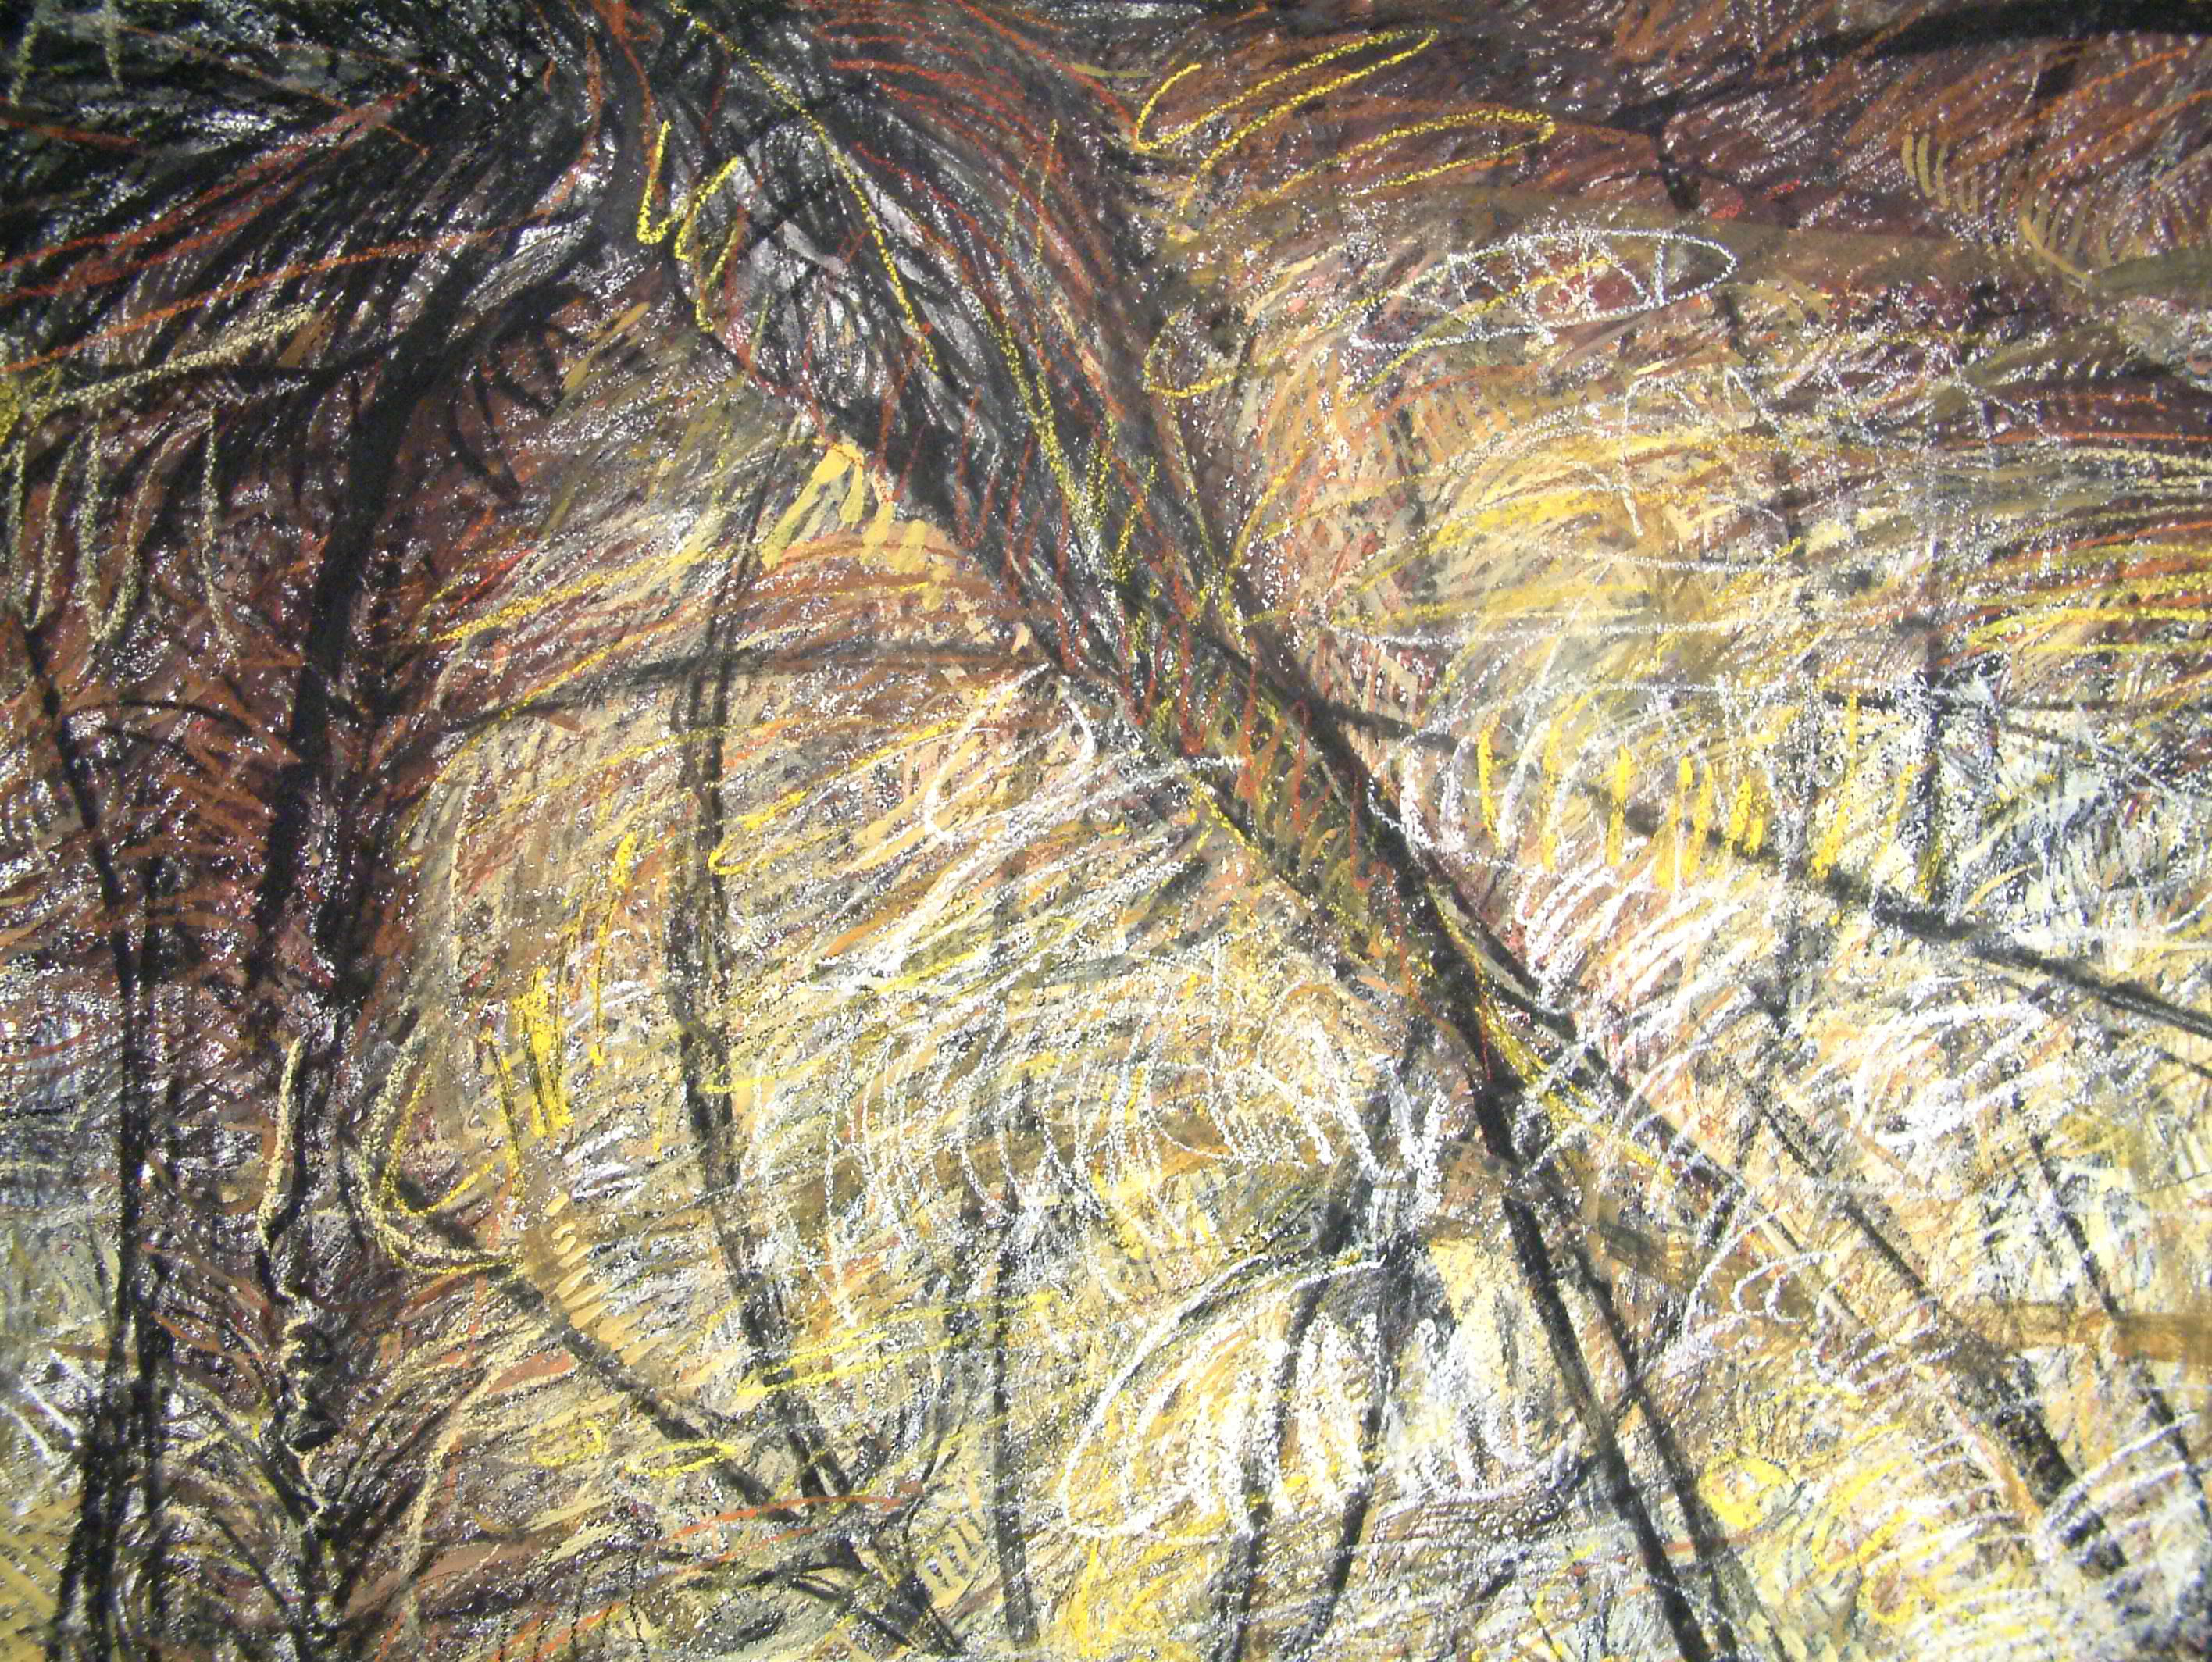 rohini-devasher-copyright-seed-wall-drawing-2004 (5)